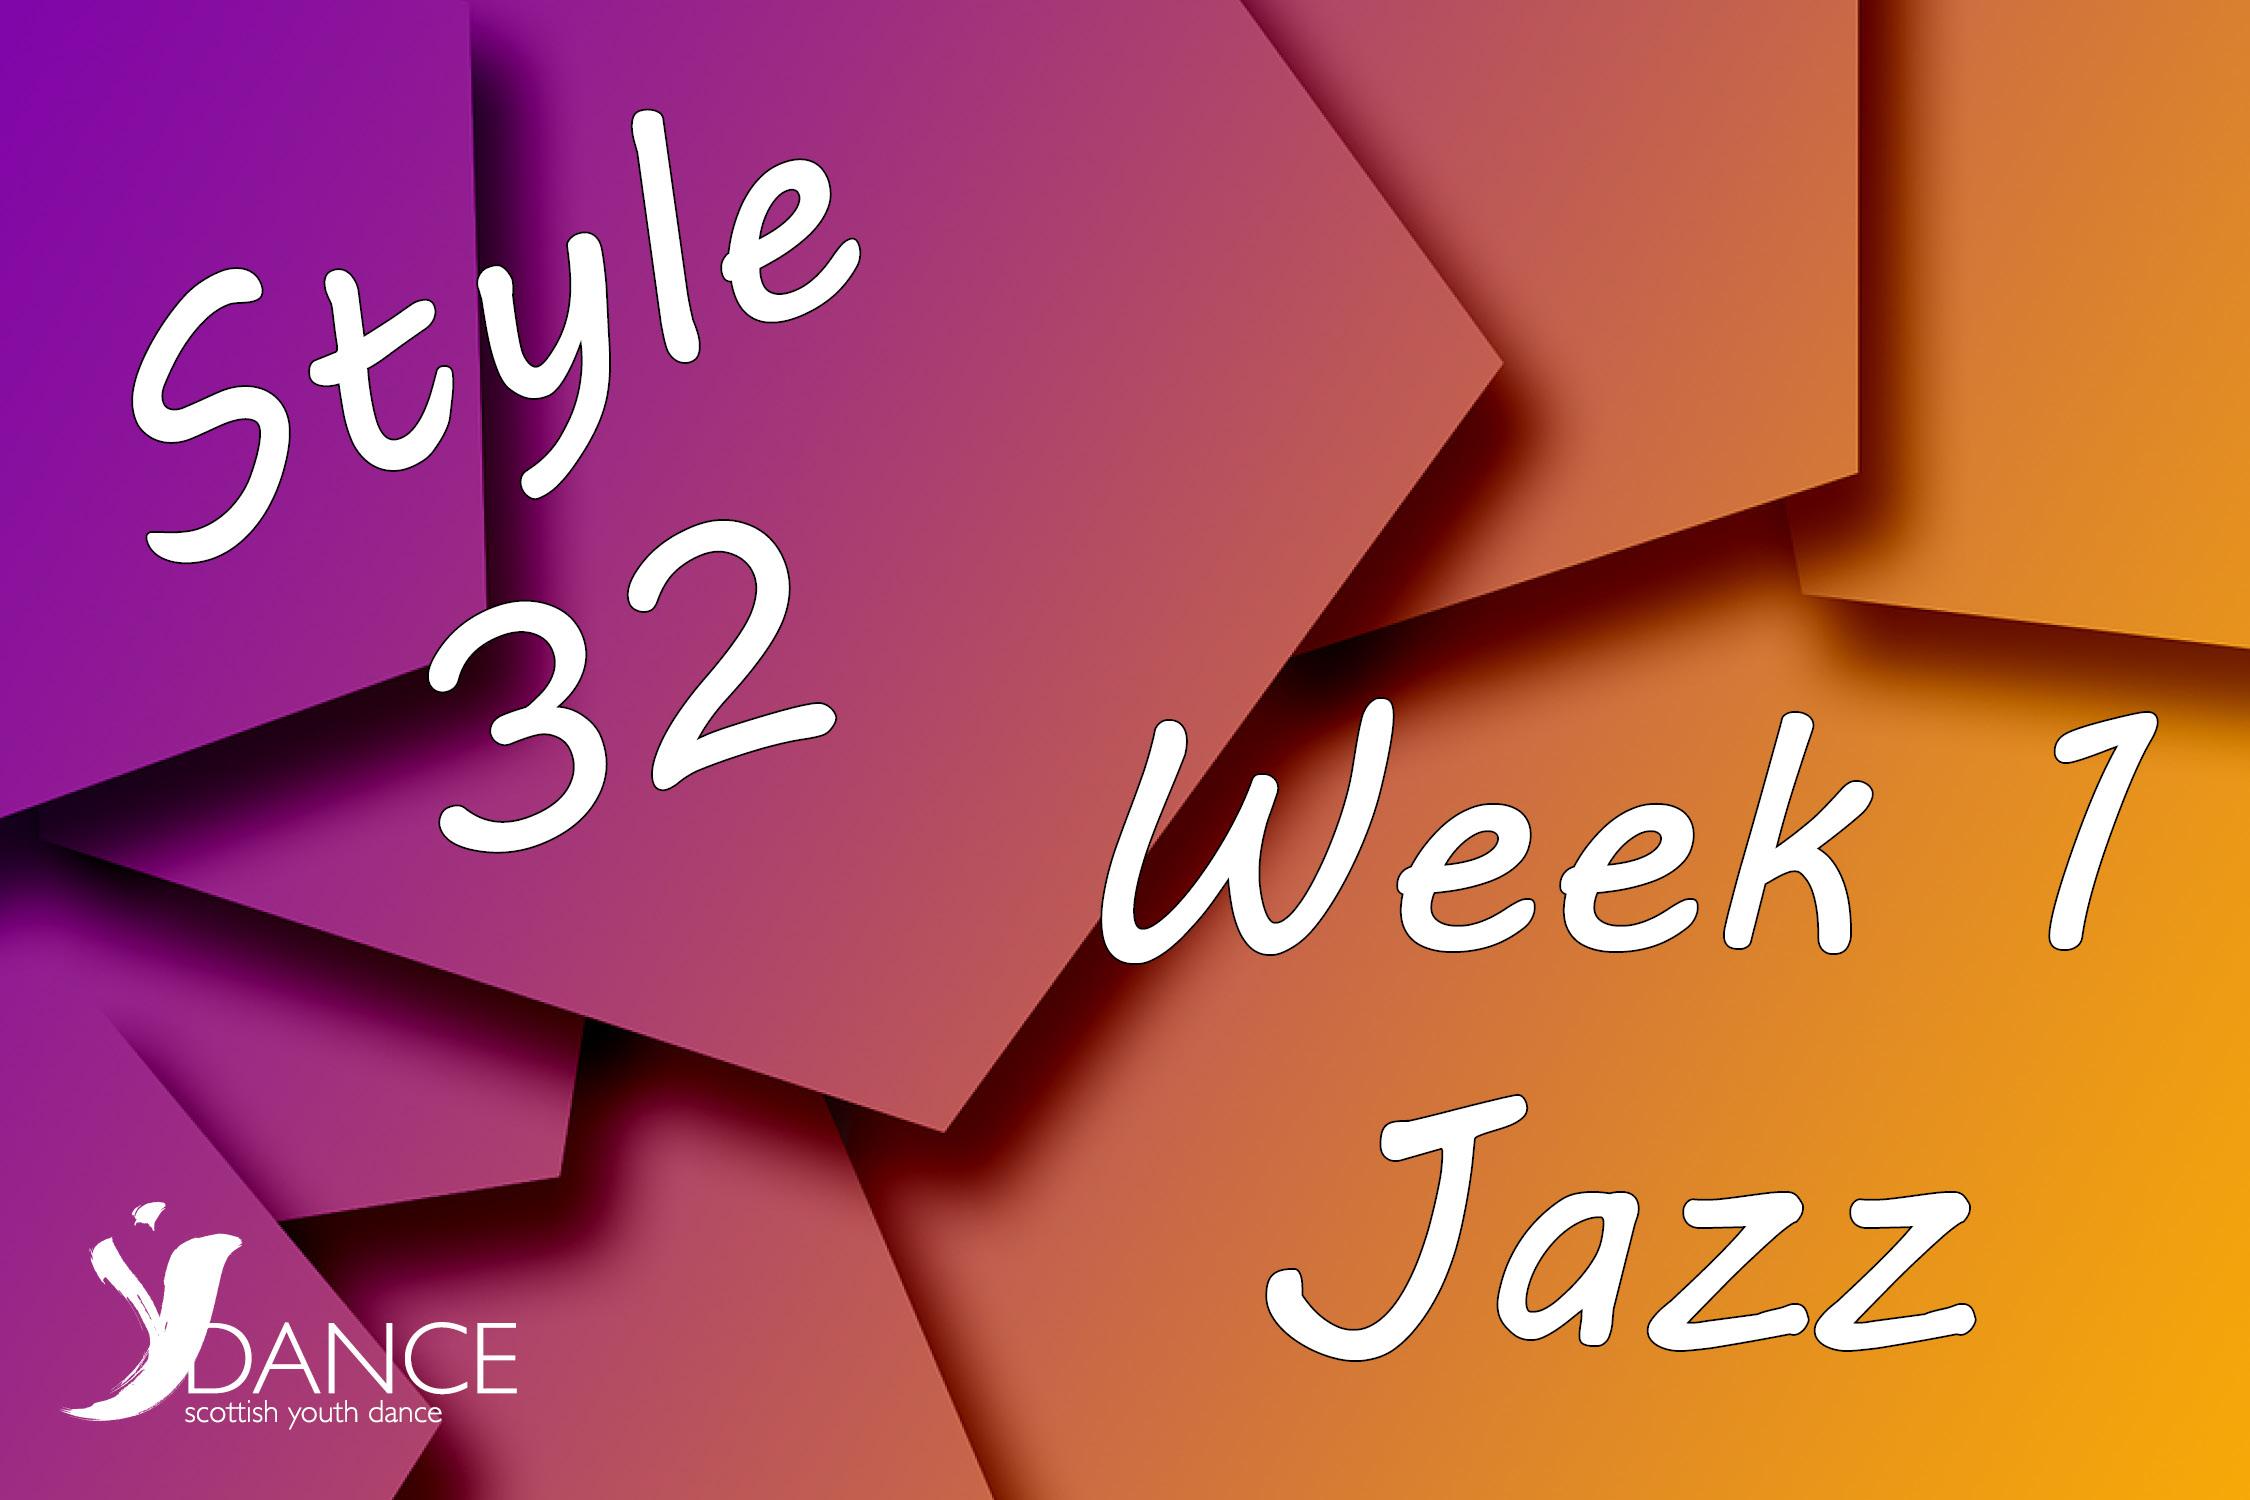 Style32 - Wk1 - Jazz